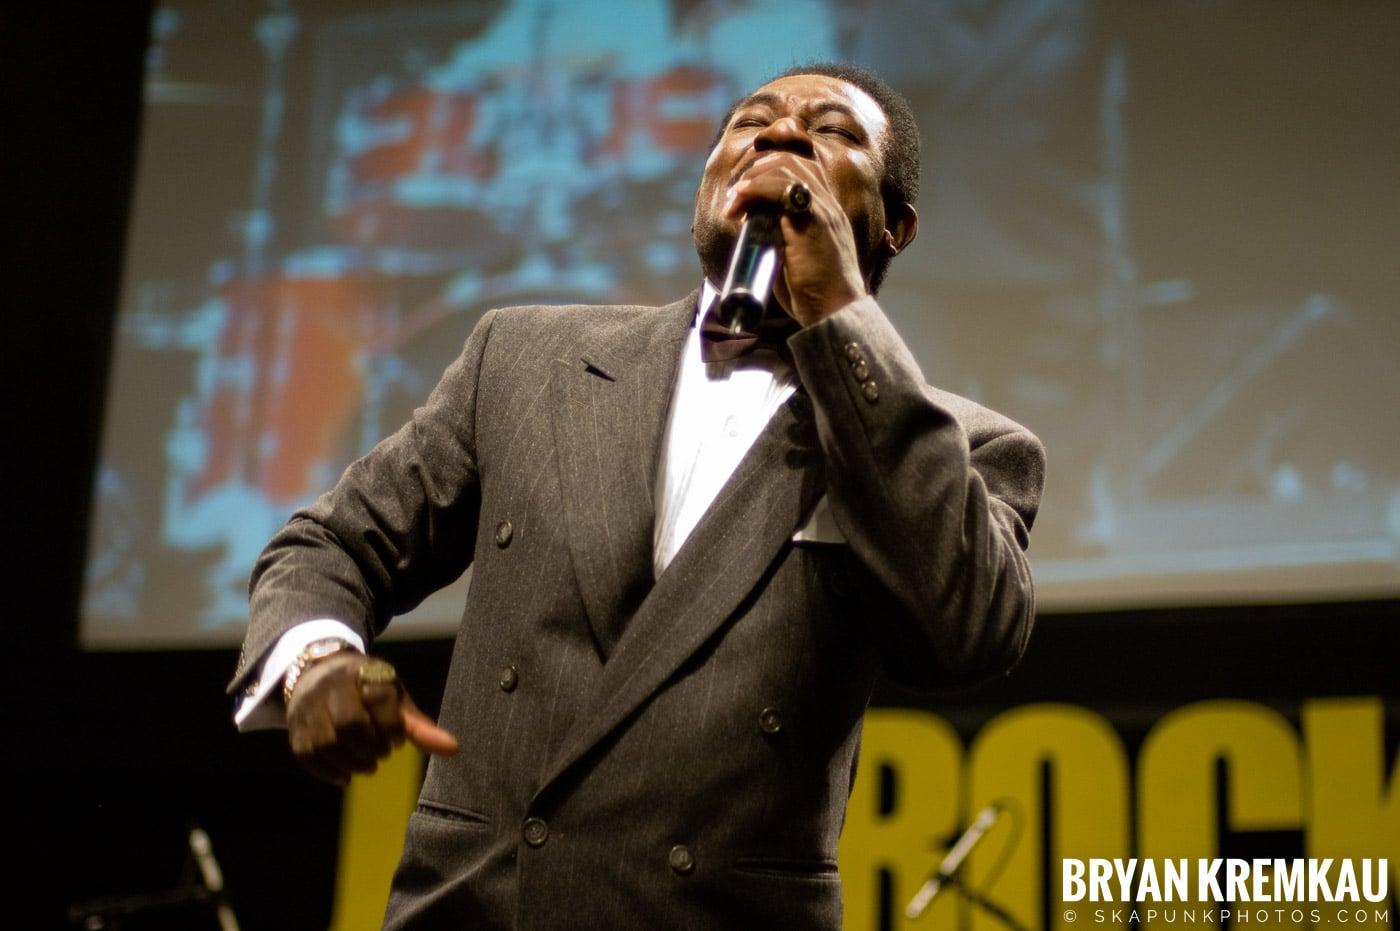 Pat Kelly @ Vintage Reggae Fest - Hammerstein Ballroom, NYC - 12.16.07 (15)